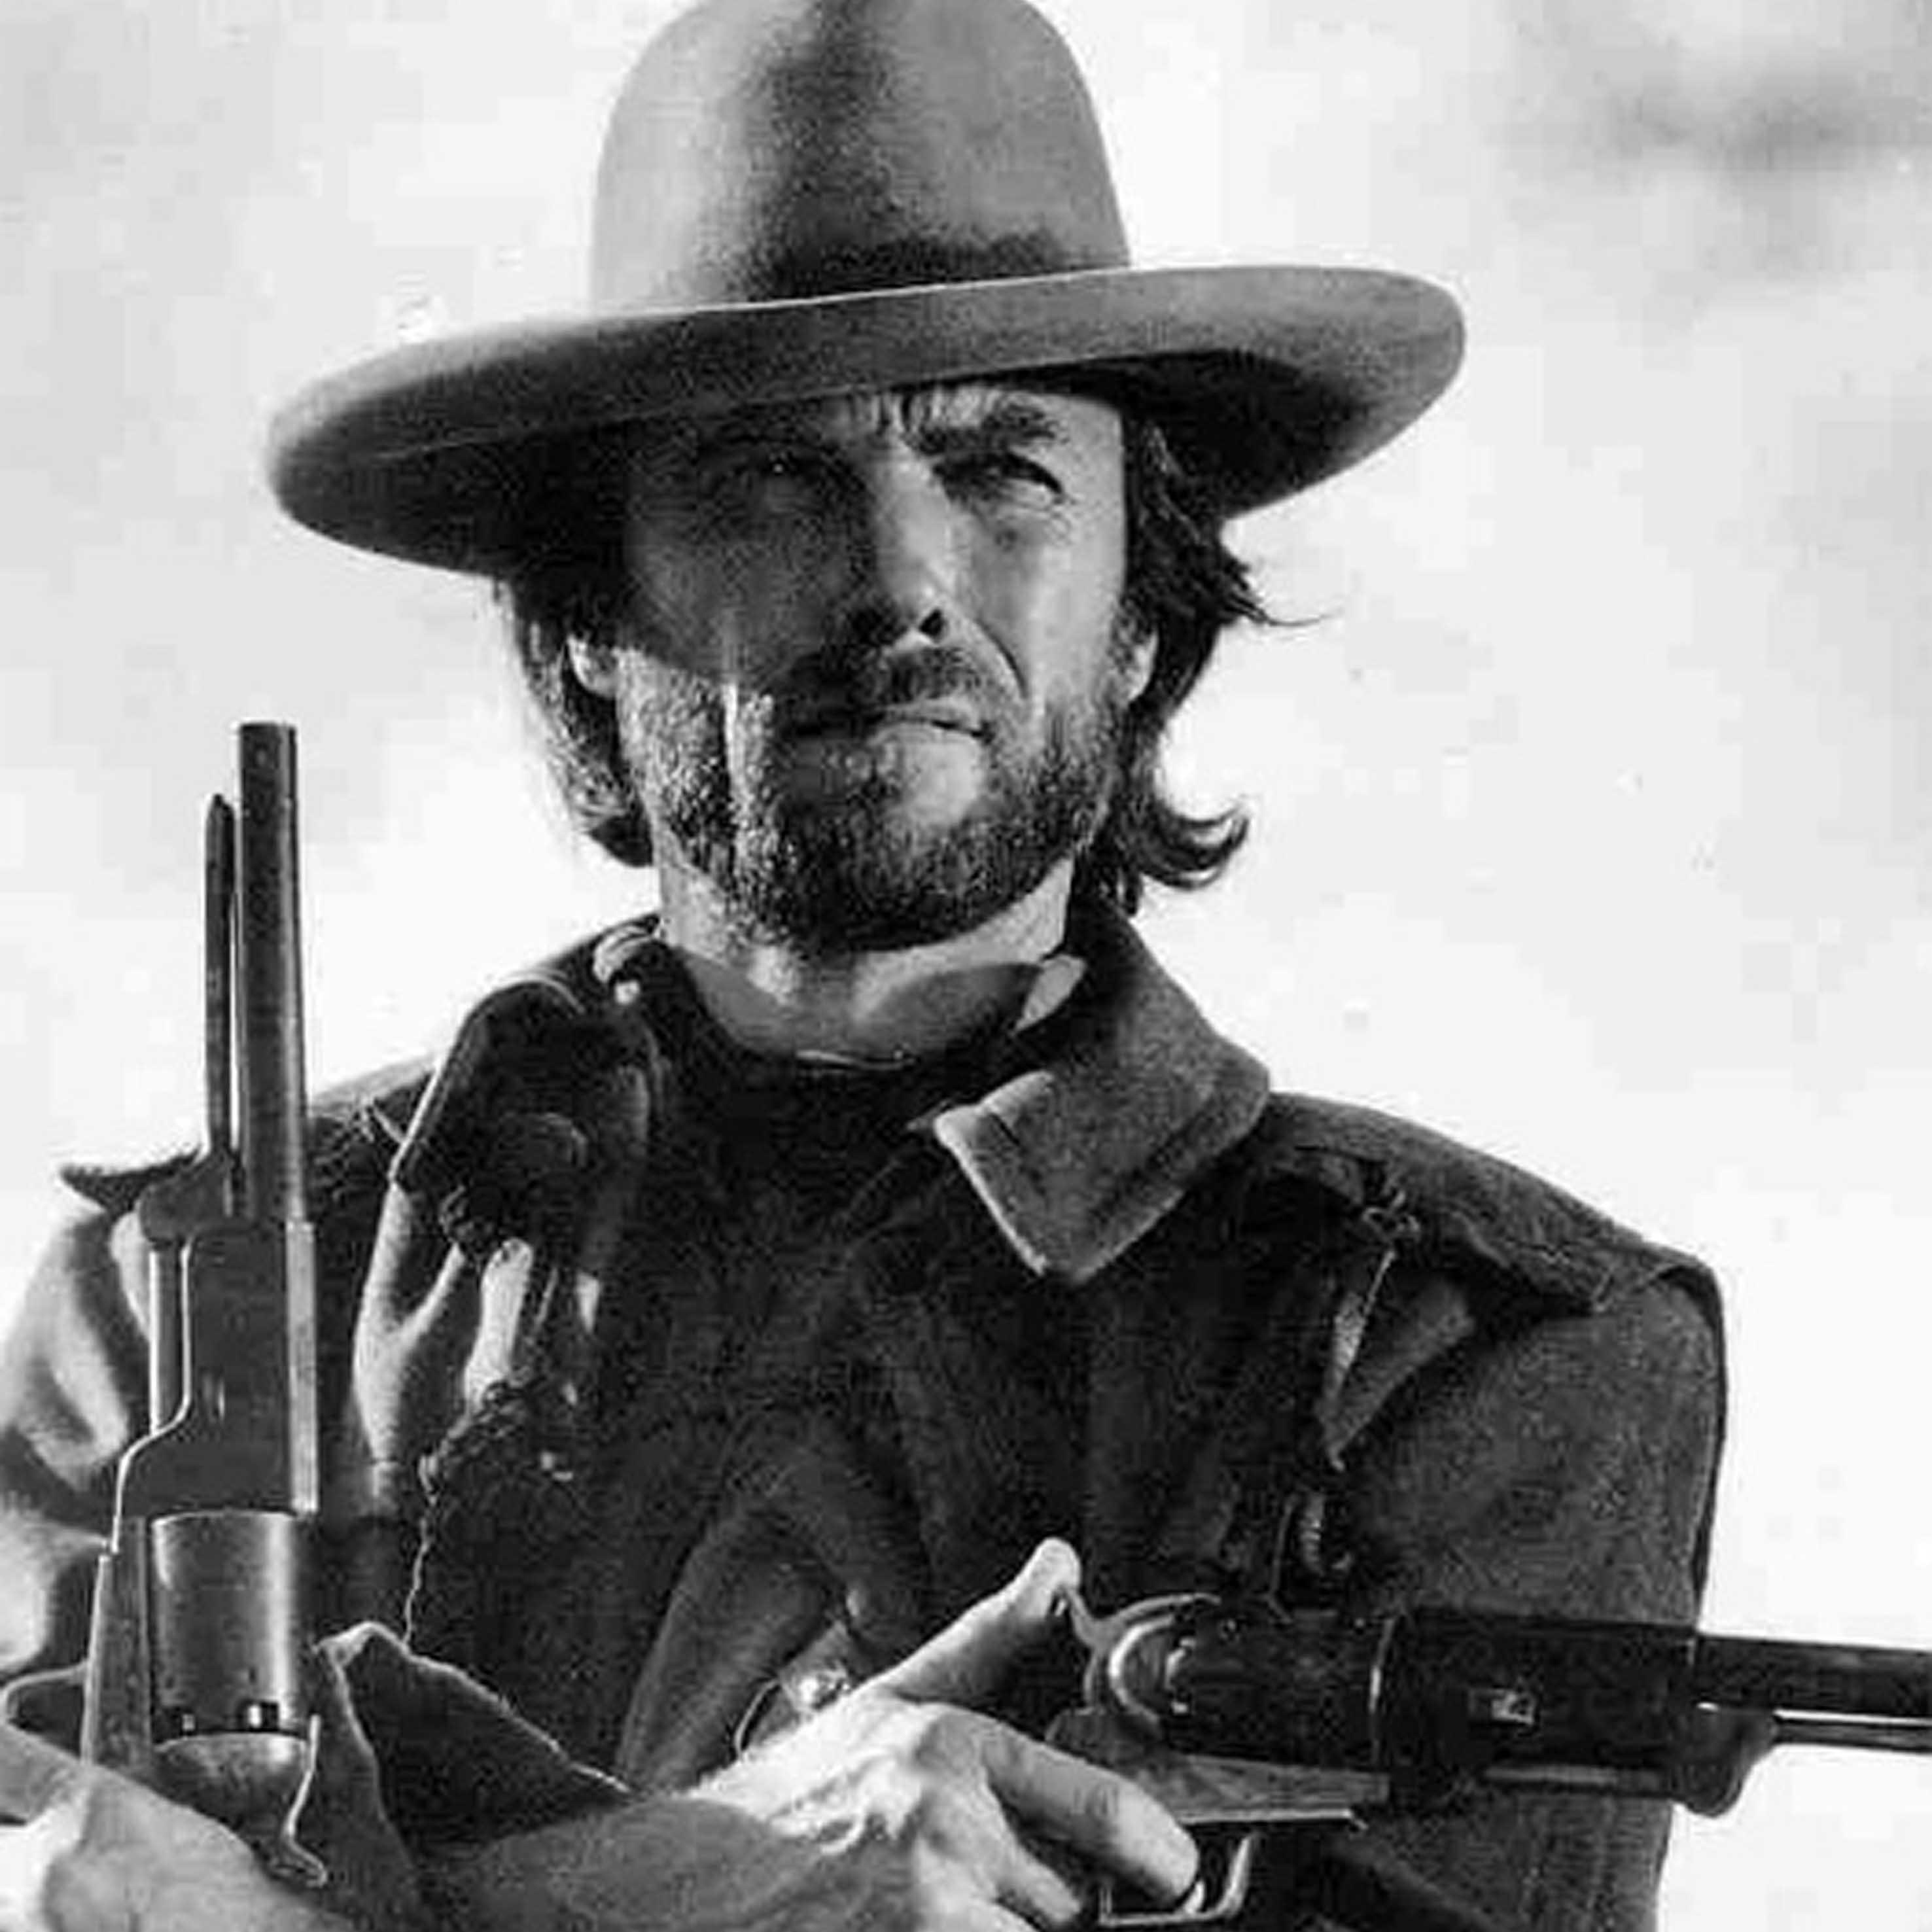 Clint Eastwood Hd Wallpapers 7wallpapersnet